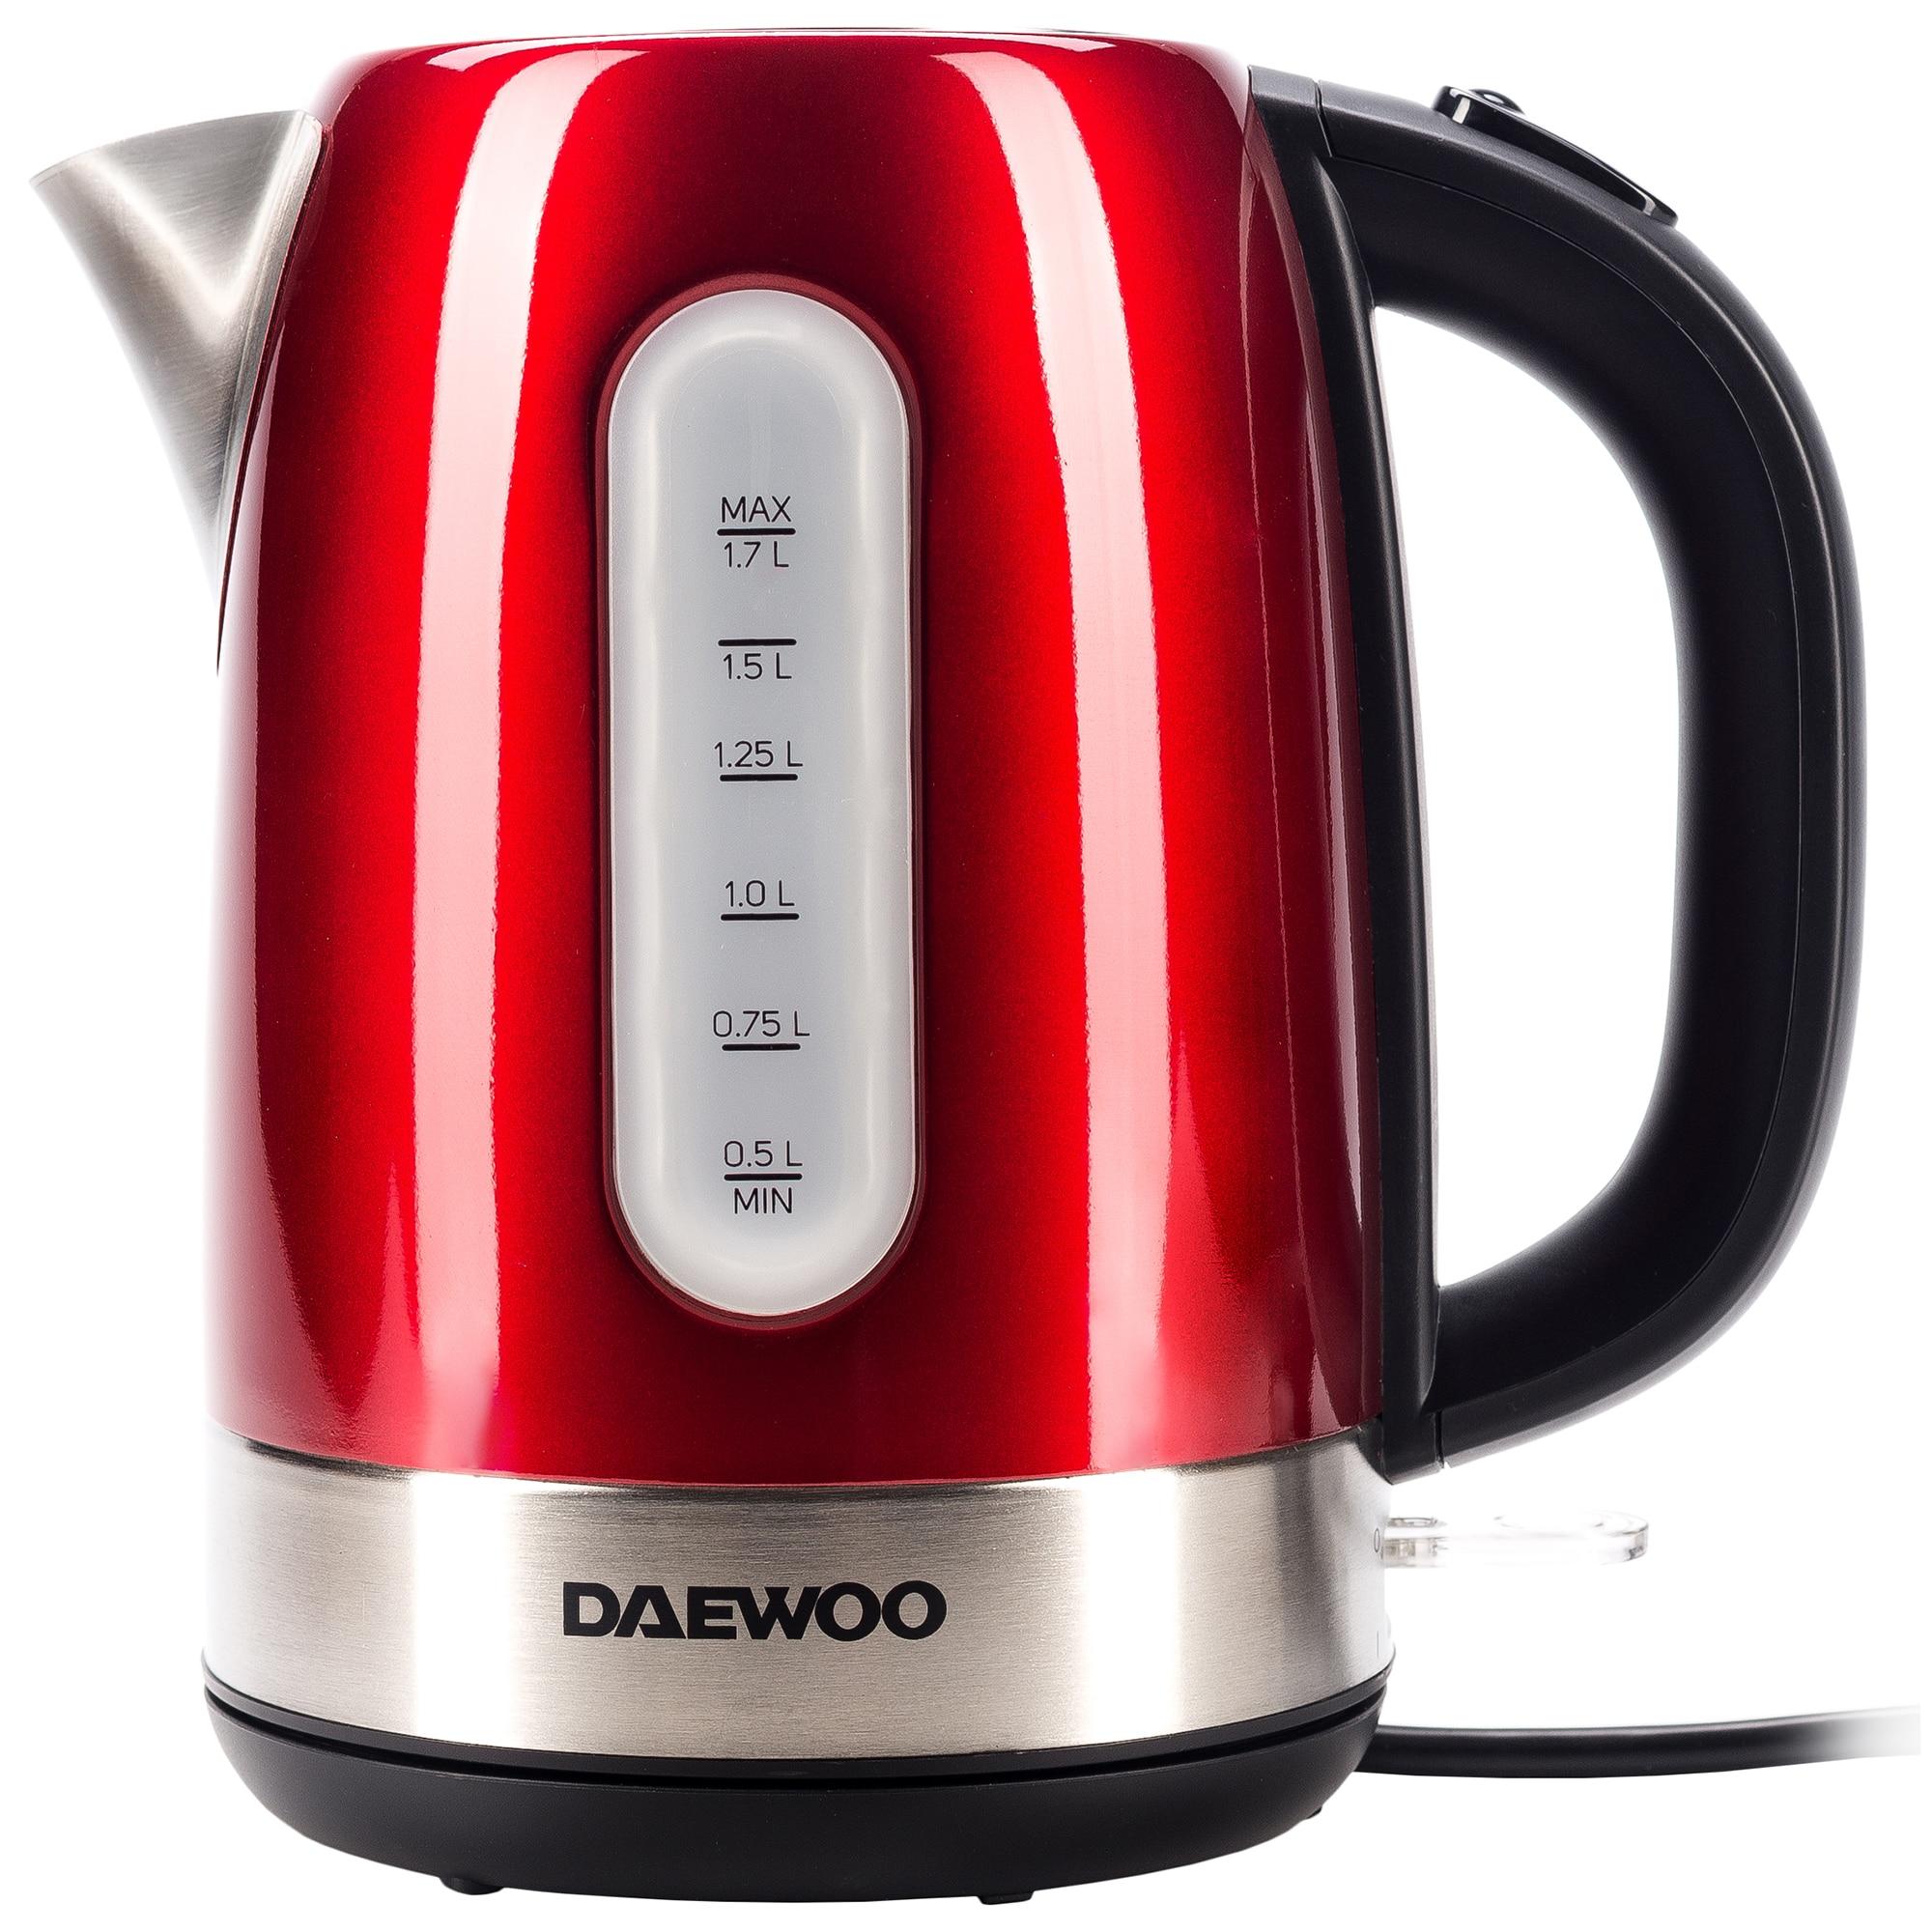 Fotografie Fierbator apa Daewoo DK2400R, 2400 W, 1.7 l, indicator nivel apa, protectie supraincalzire, oprire automata, Rosu/Inox